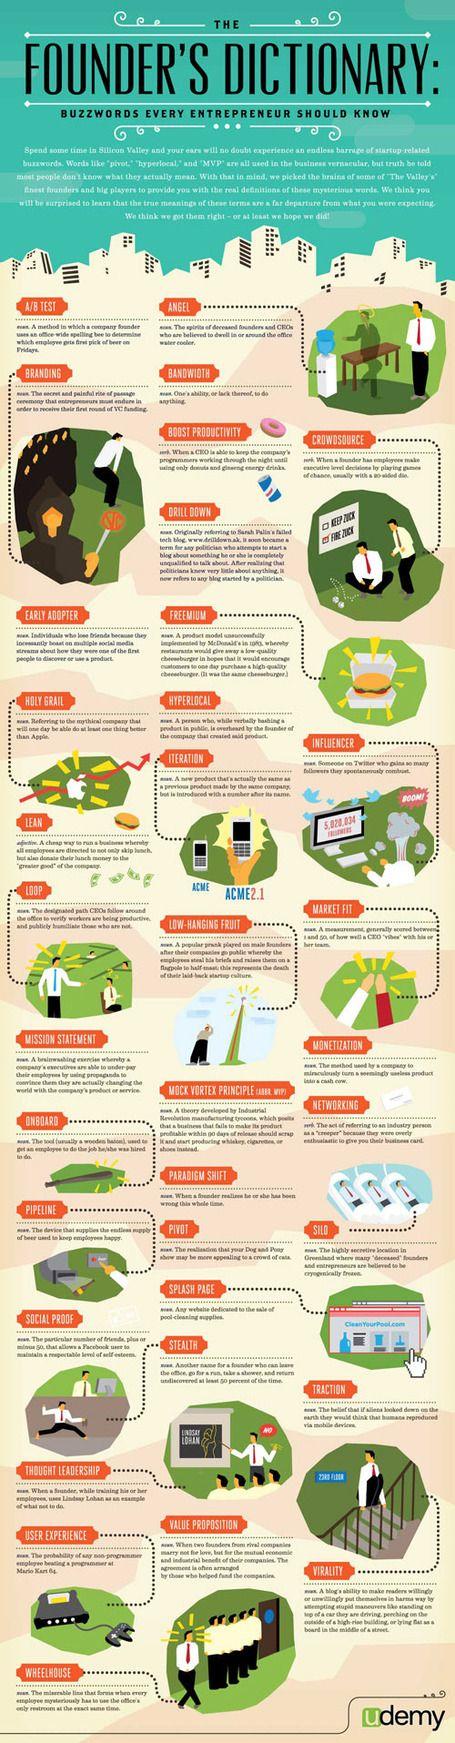 Buzz foundry... #startup #entrepreneur